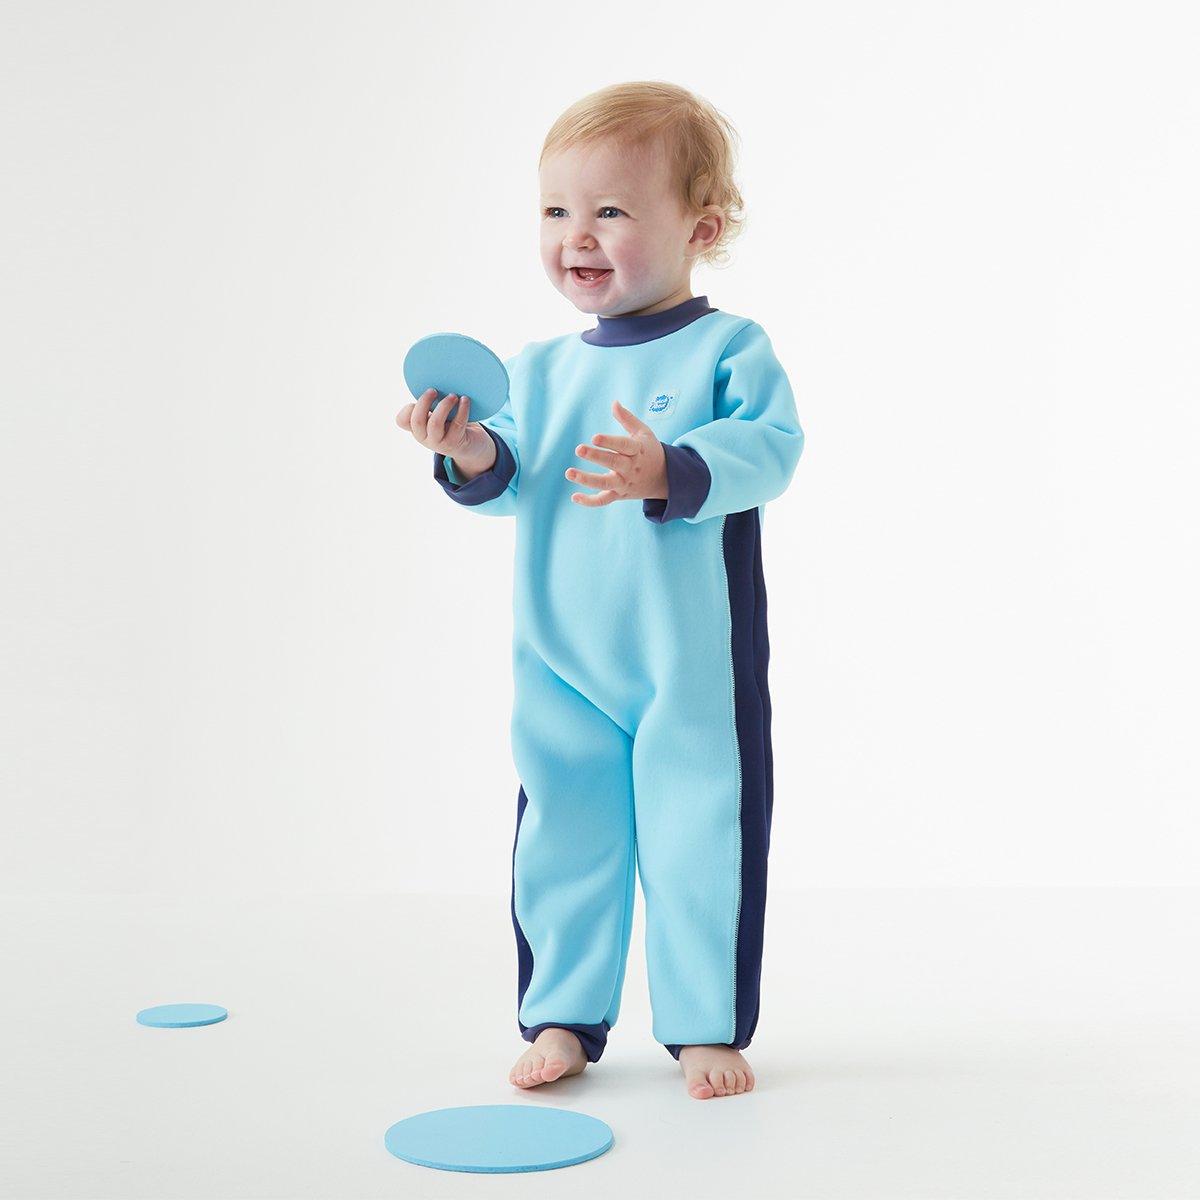 Splash About Childrens Warm in One Wetsuit